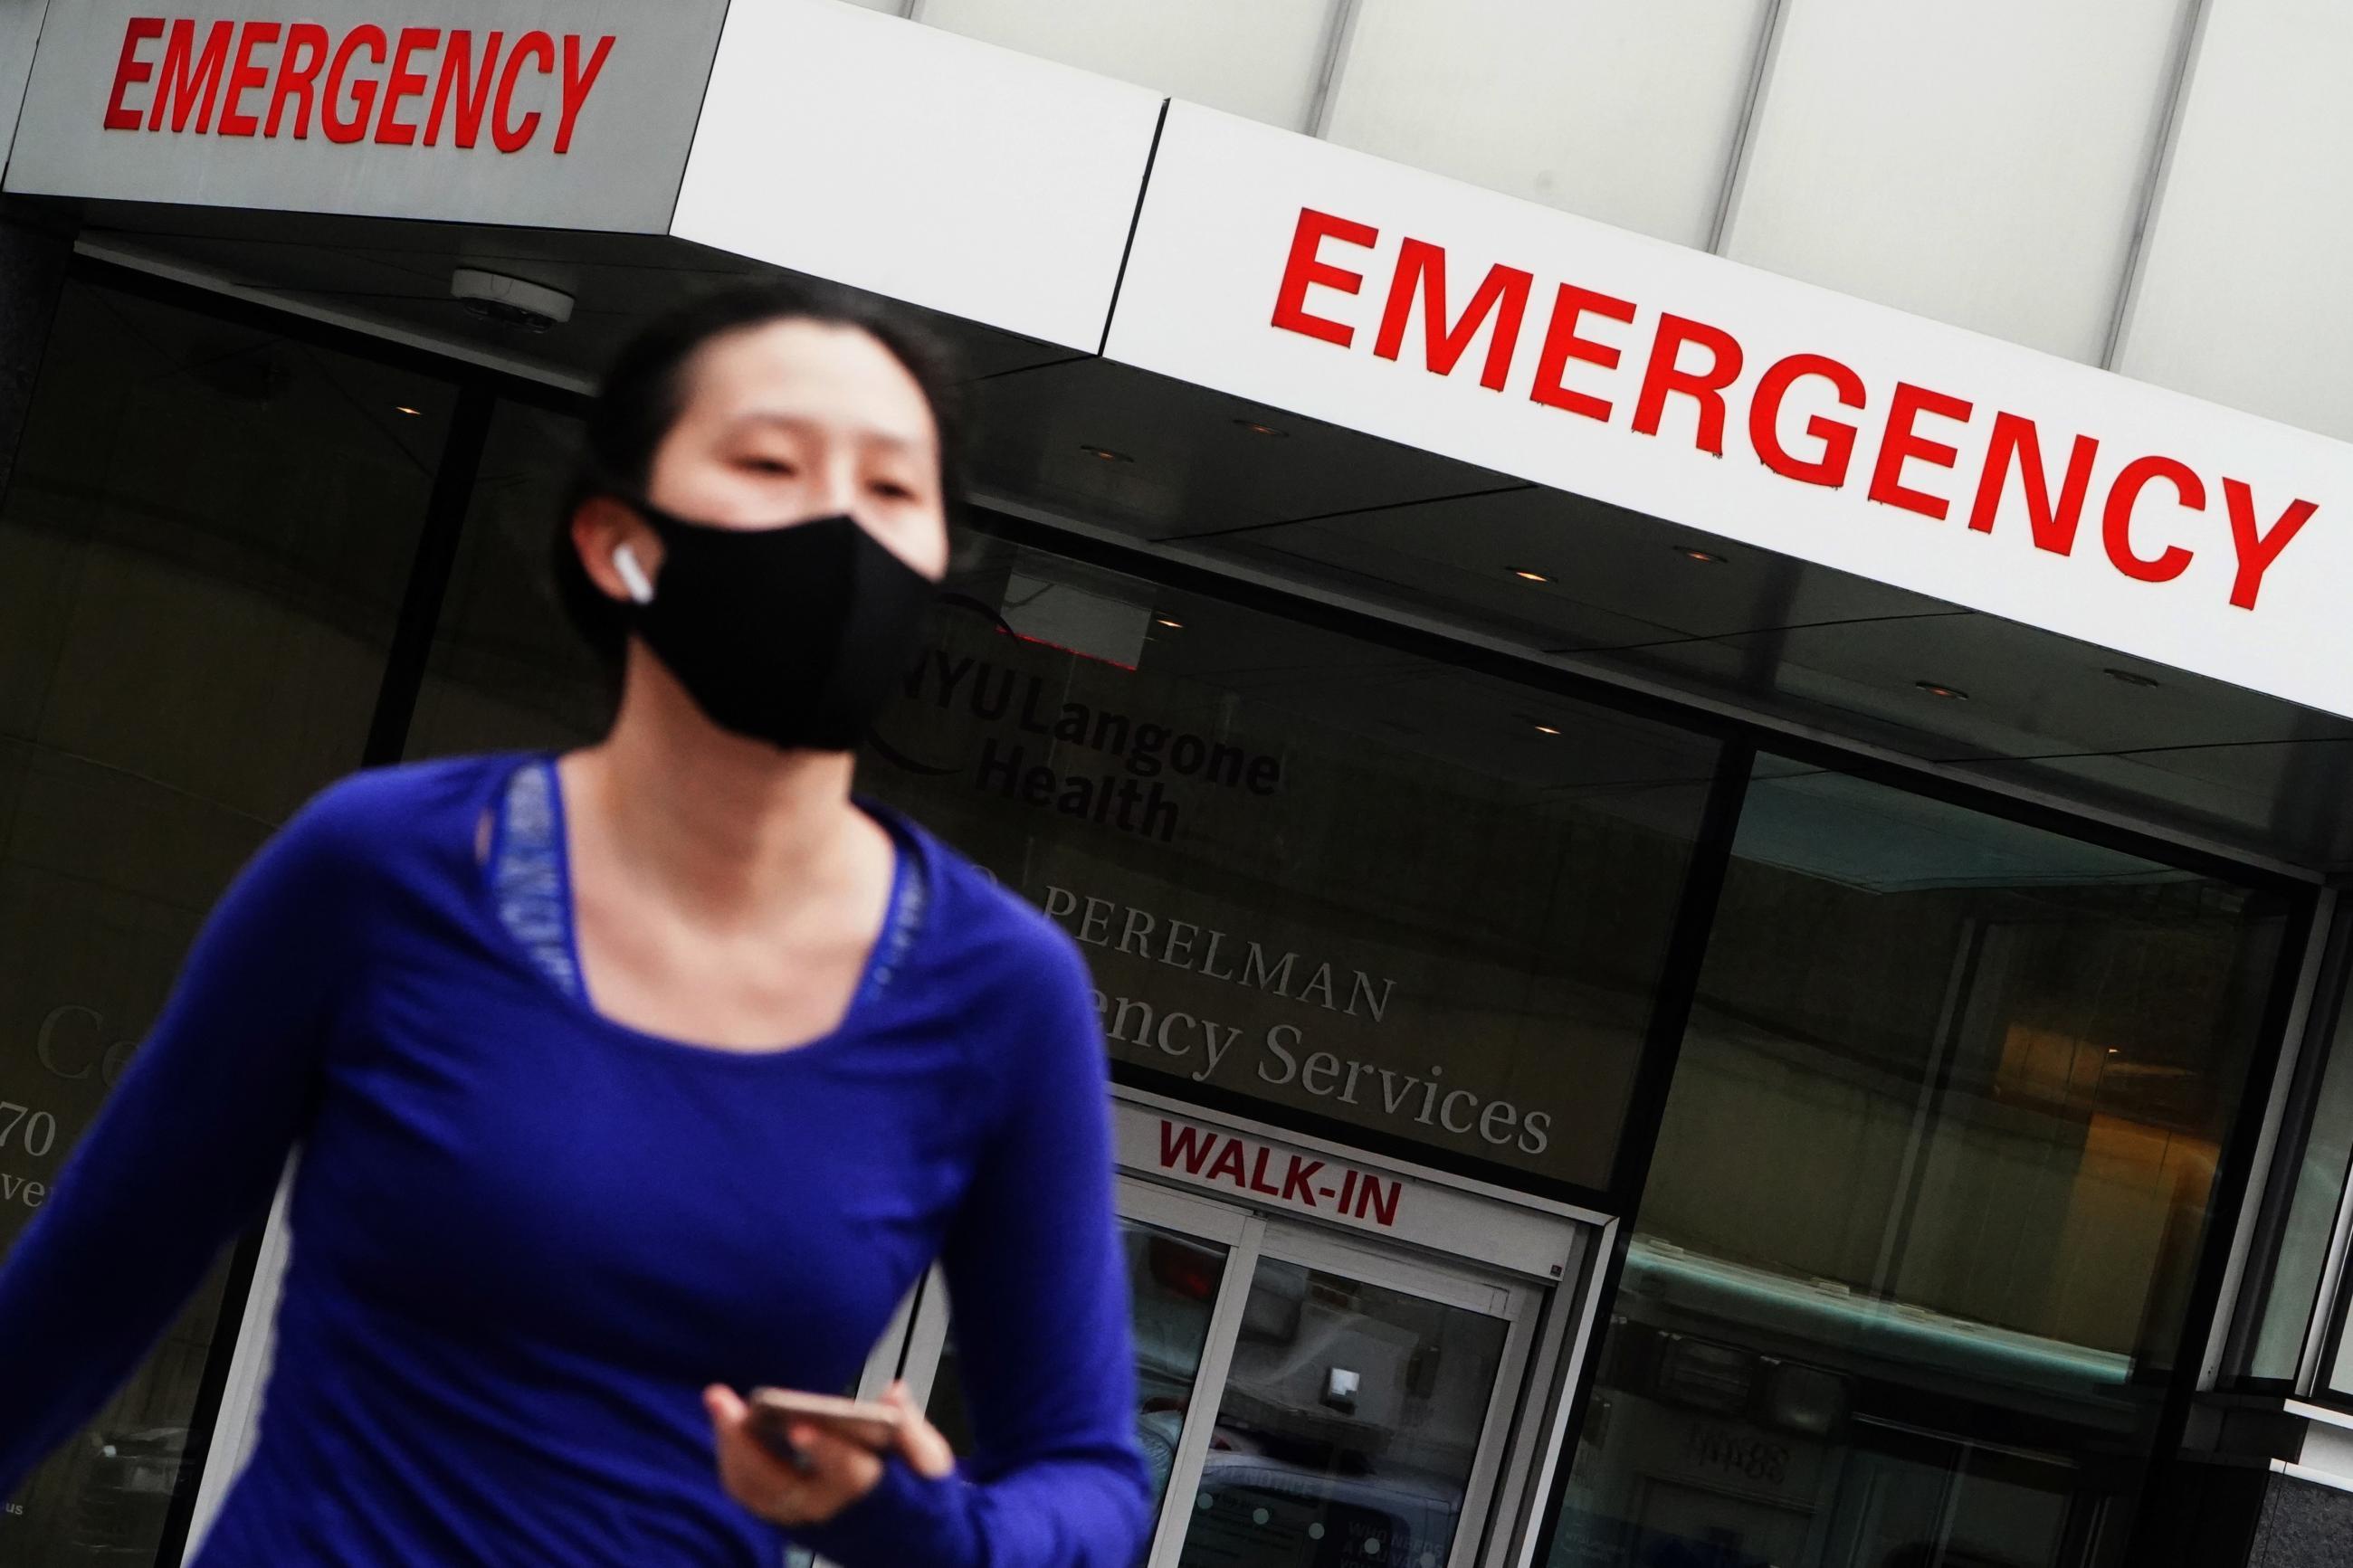 A woman walks away from a hospital emergency department amid the coronavirus disease (COVID-19) pandemic in the Manhattan borough of New York City, New York, U.S., December 24, 2020